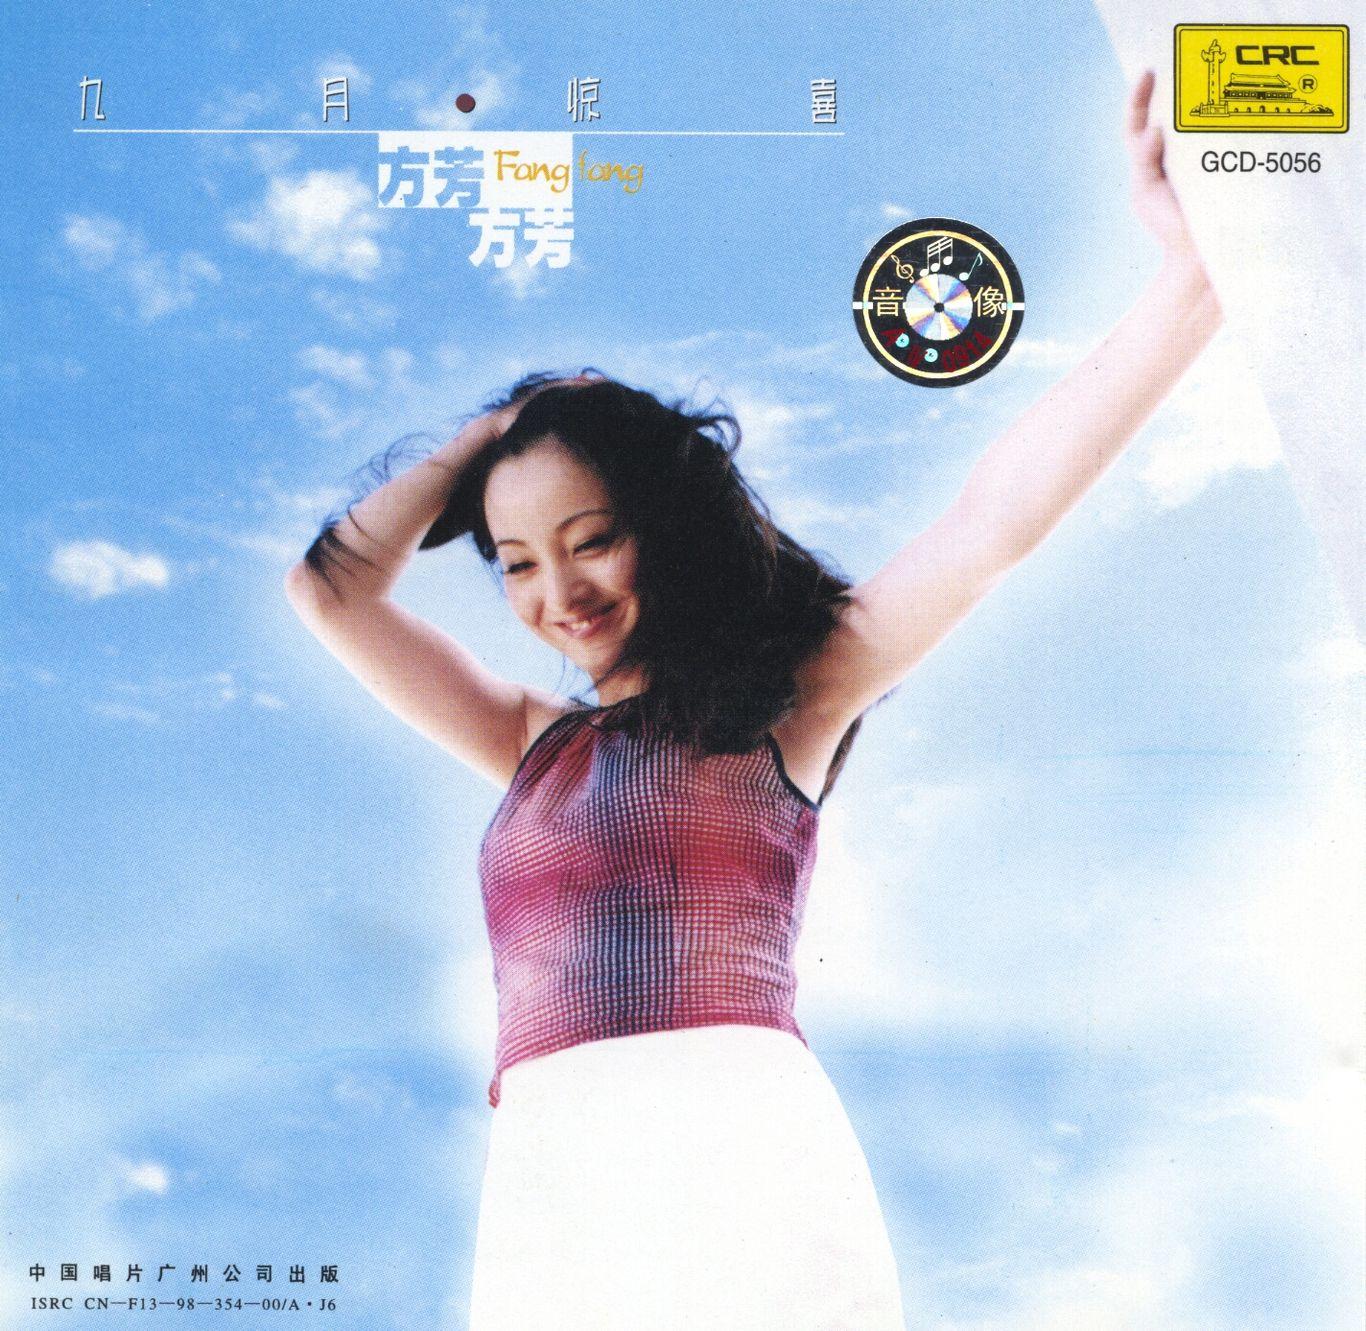 Feel Free To Love (Fang Xin Qu Ai) by Fang Fang | Sample on Tracklib